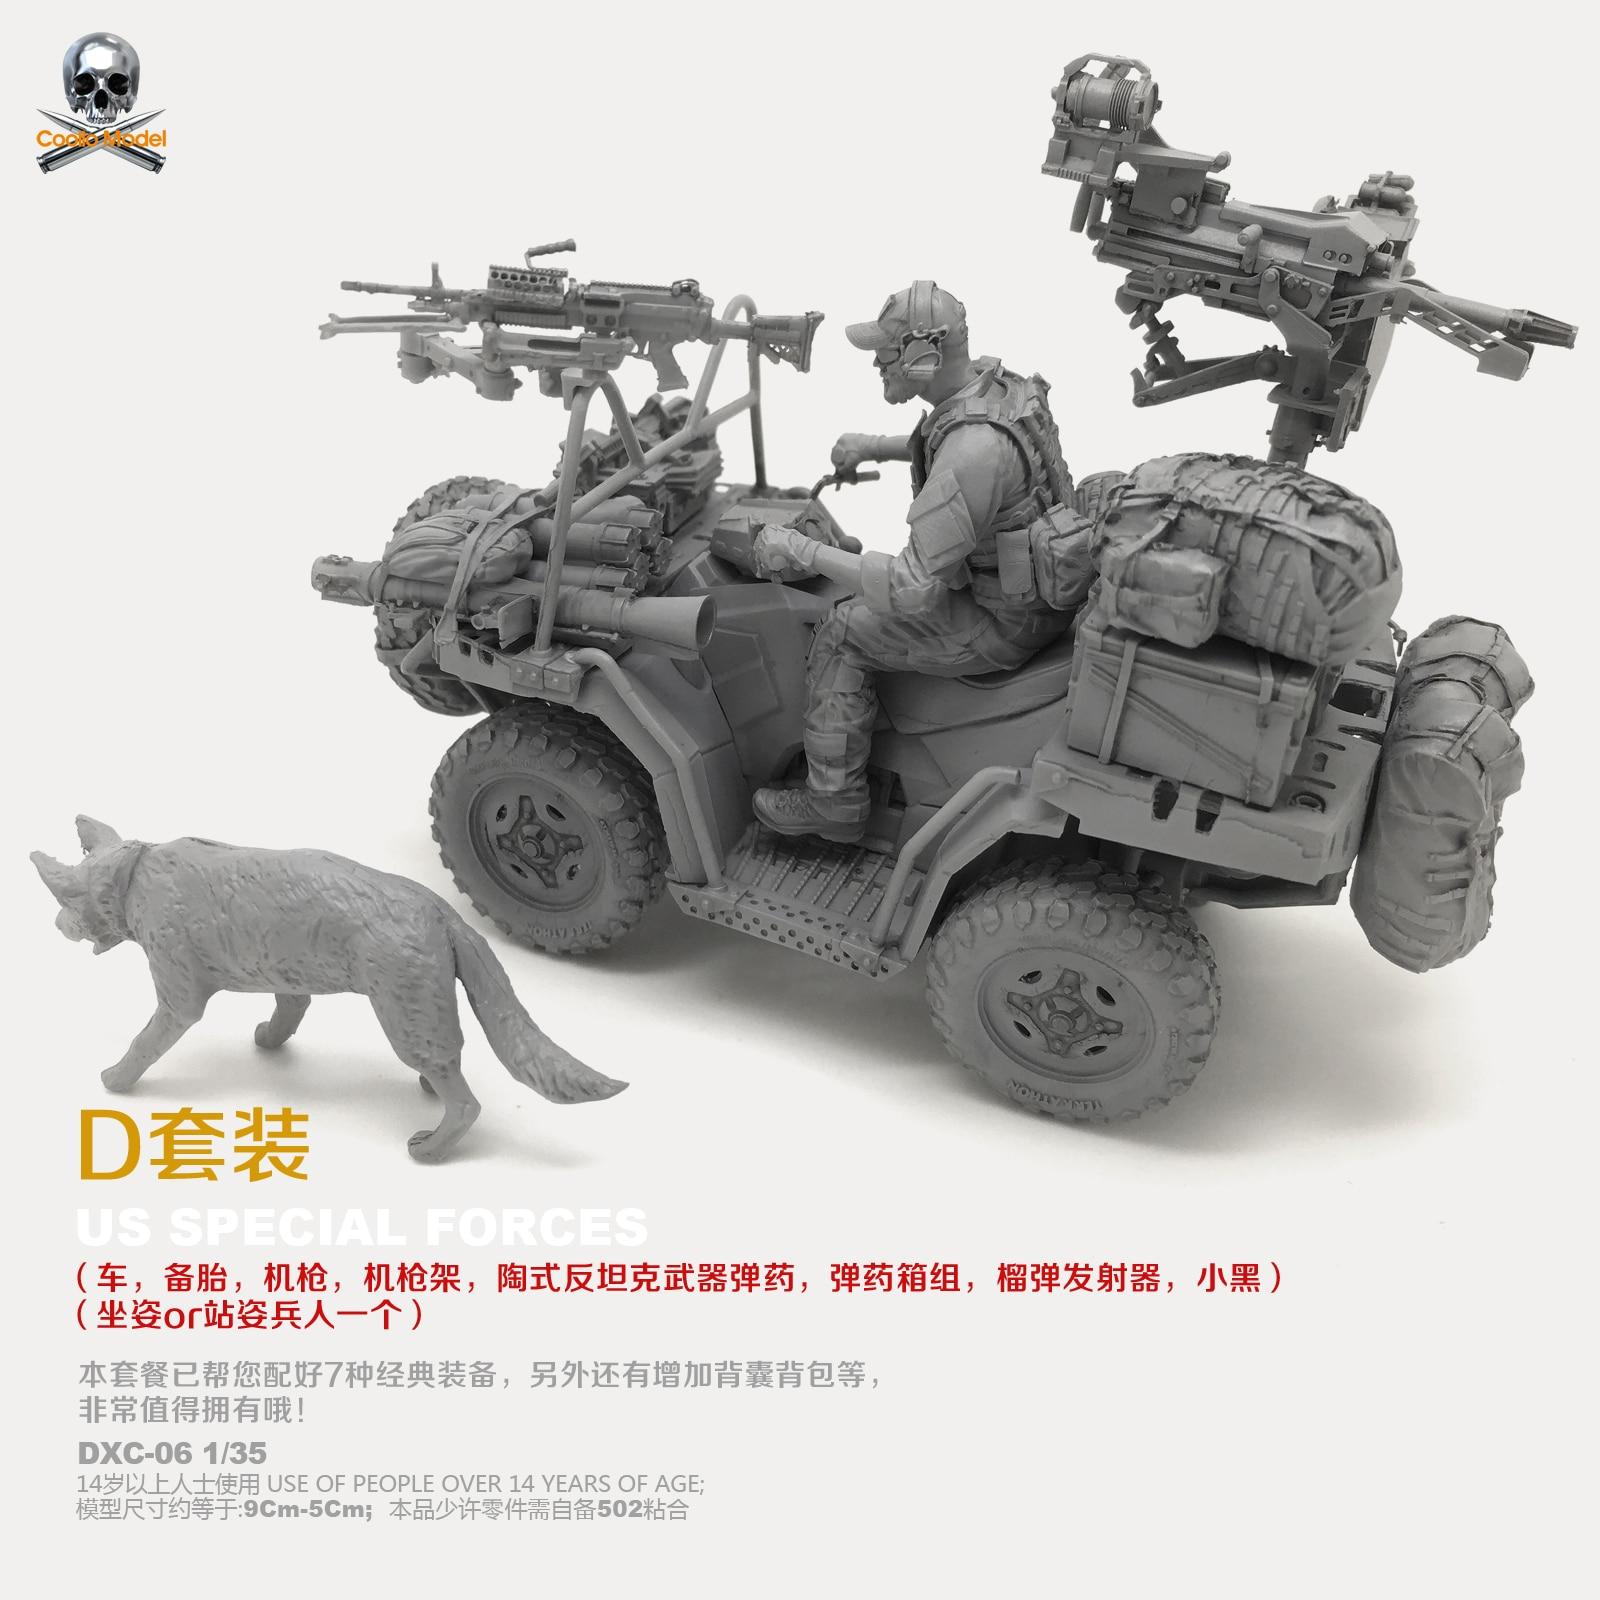 1/35 Resin Kits US Navy SEALs And Terrain Vehicles (D Set) Resin Model Self-asssembled DXC-06